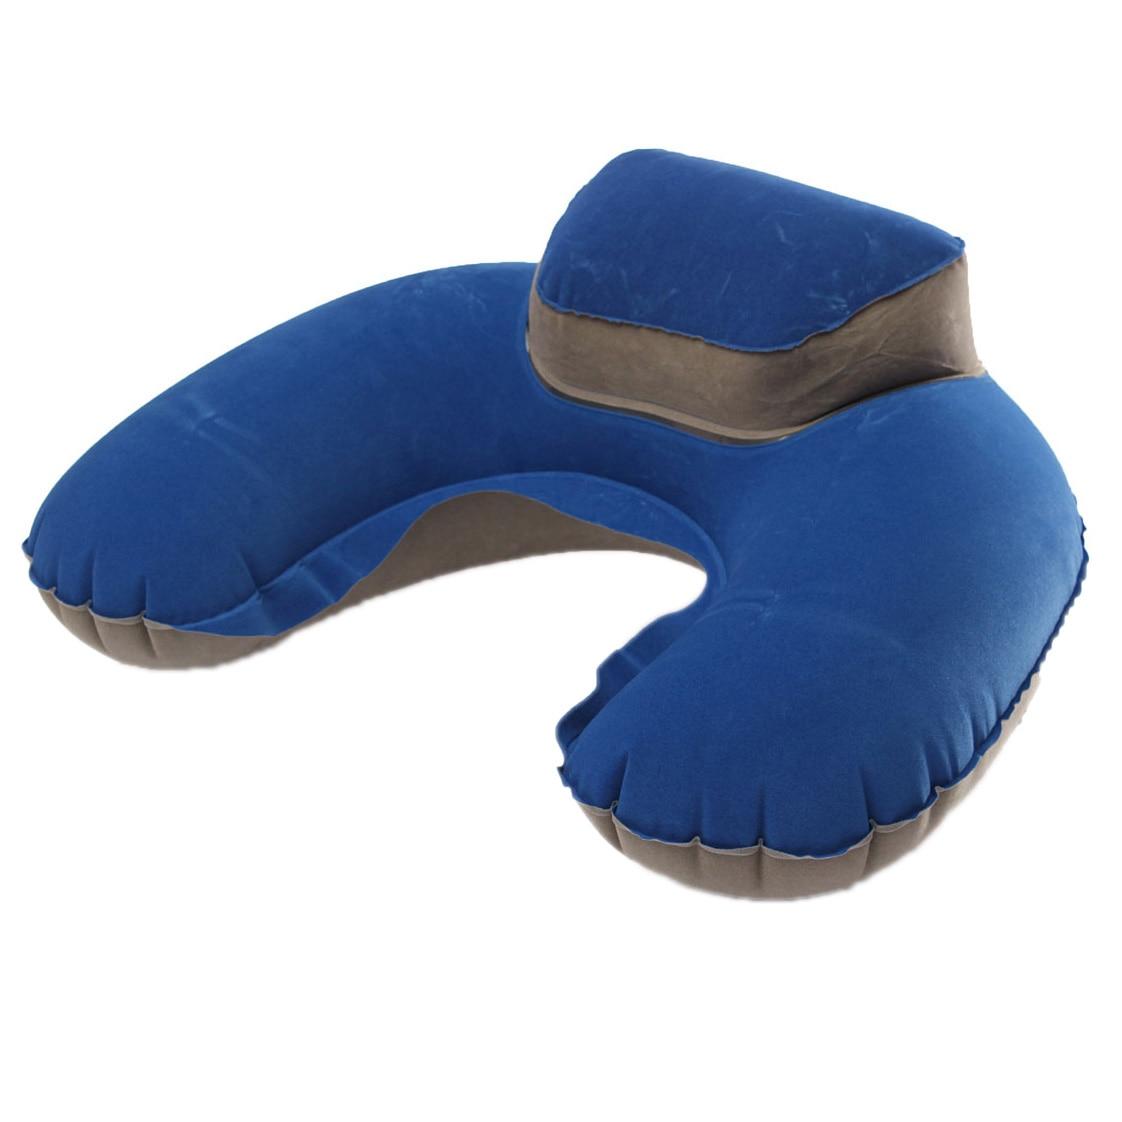 Phfu Inflatable Neck Pillow Soft Travel Air Cushion Sleep